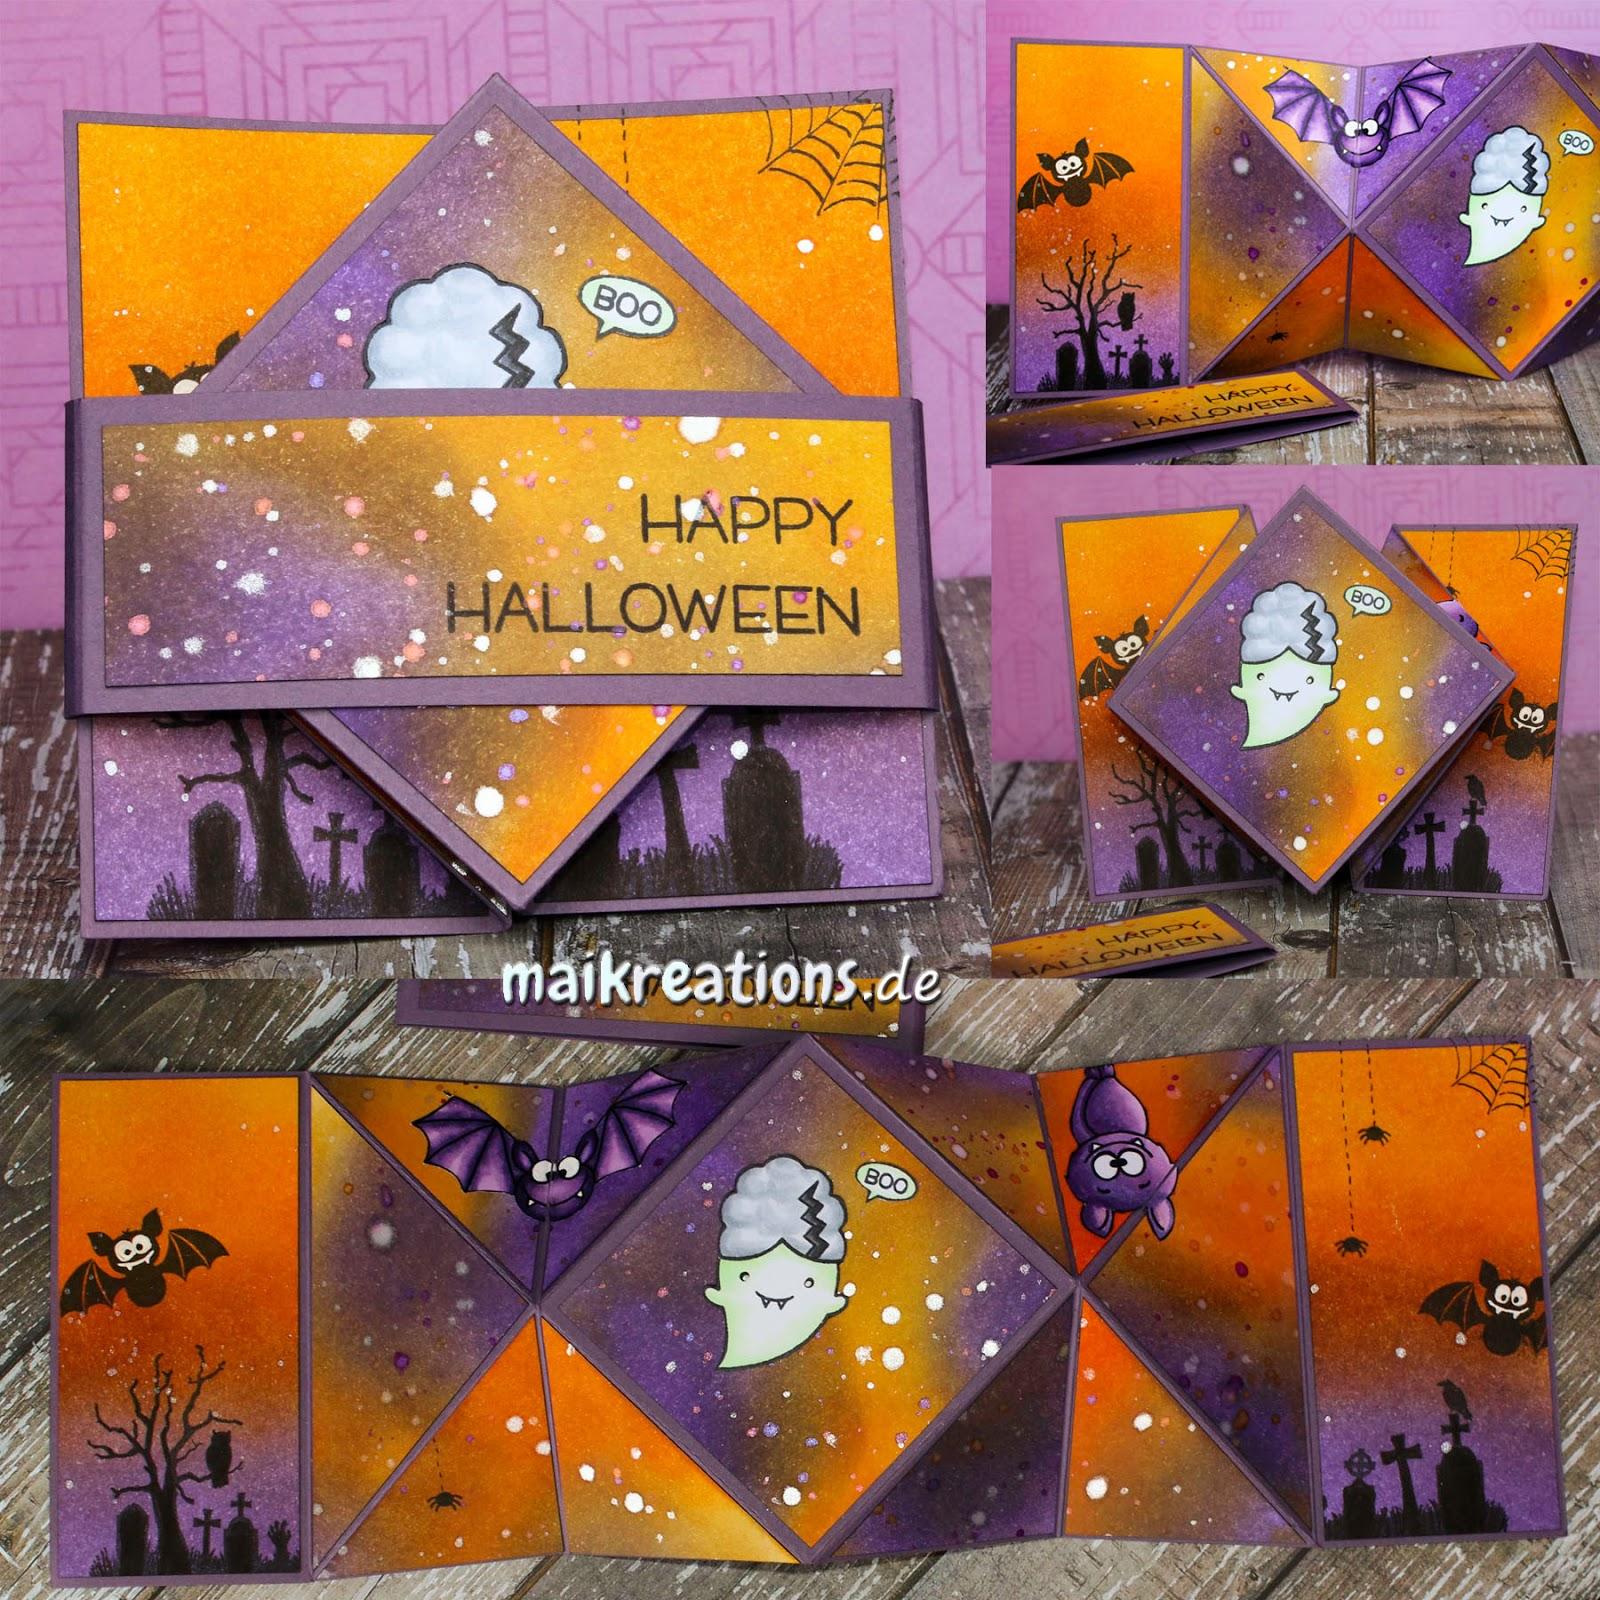 maikreations: Happy Insta Girls Halloween Hop